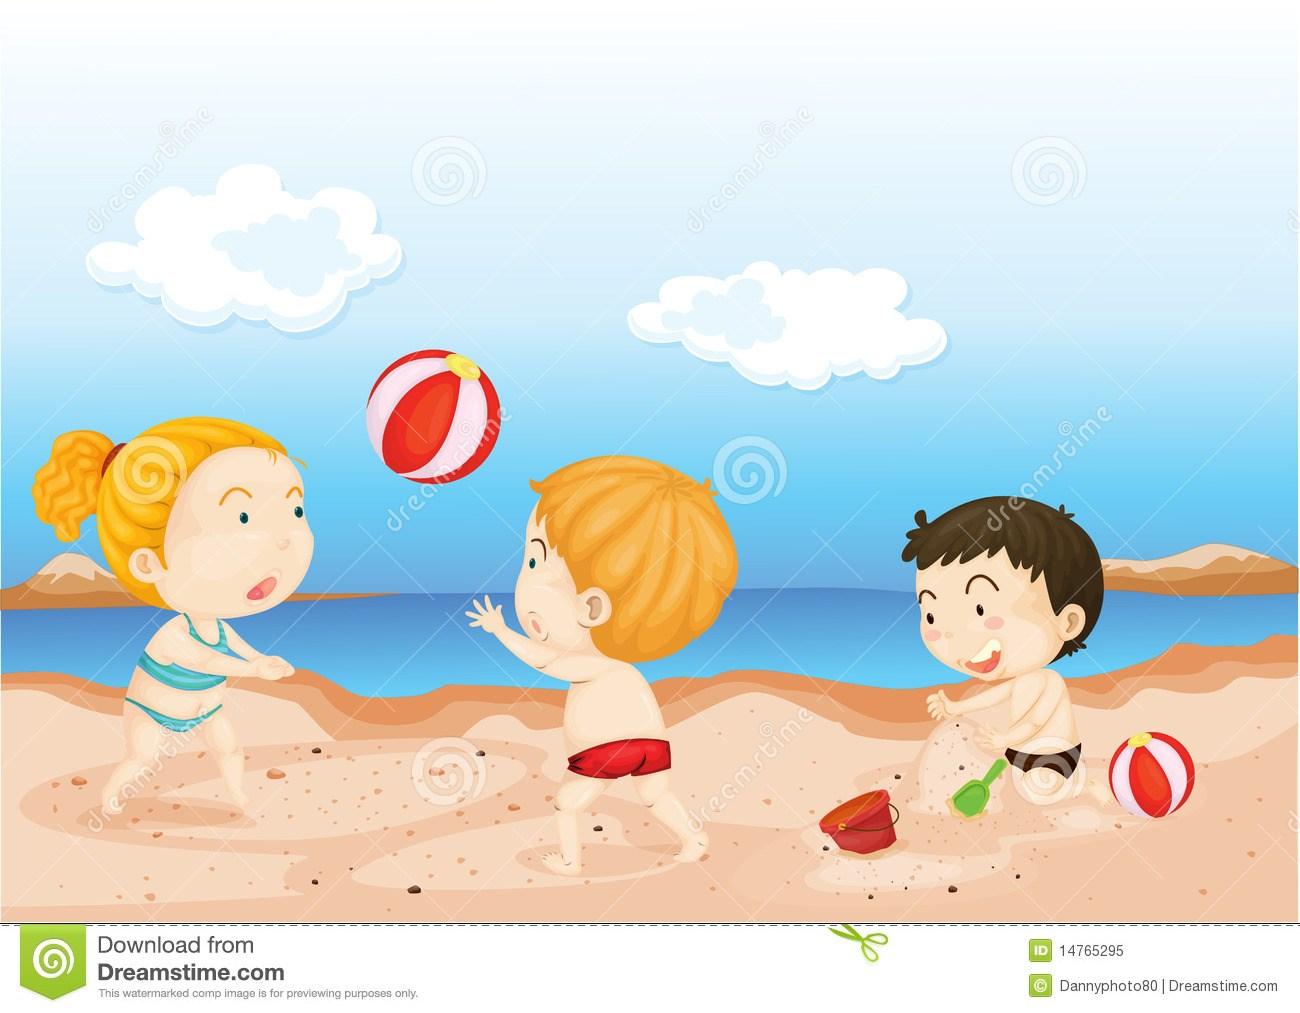 Kids on beach clipart 2 » Clipart Portal.